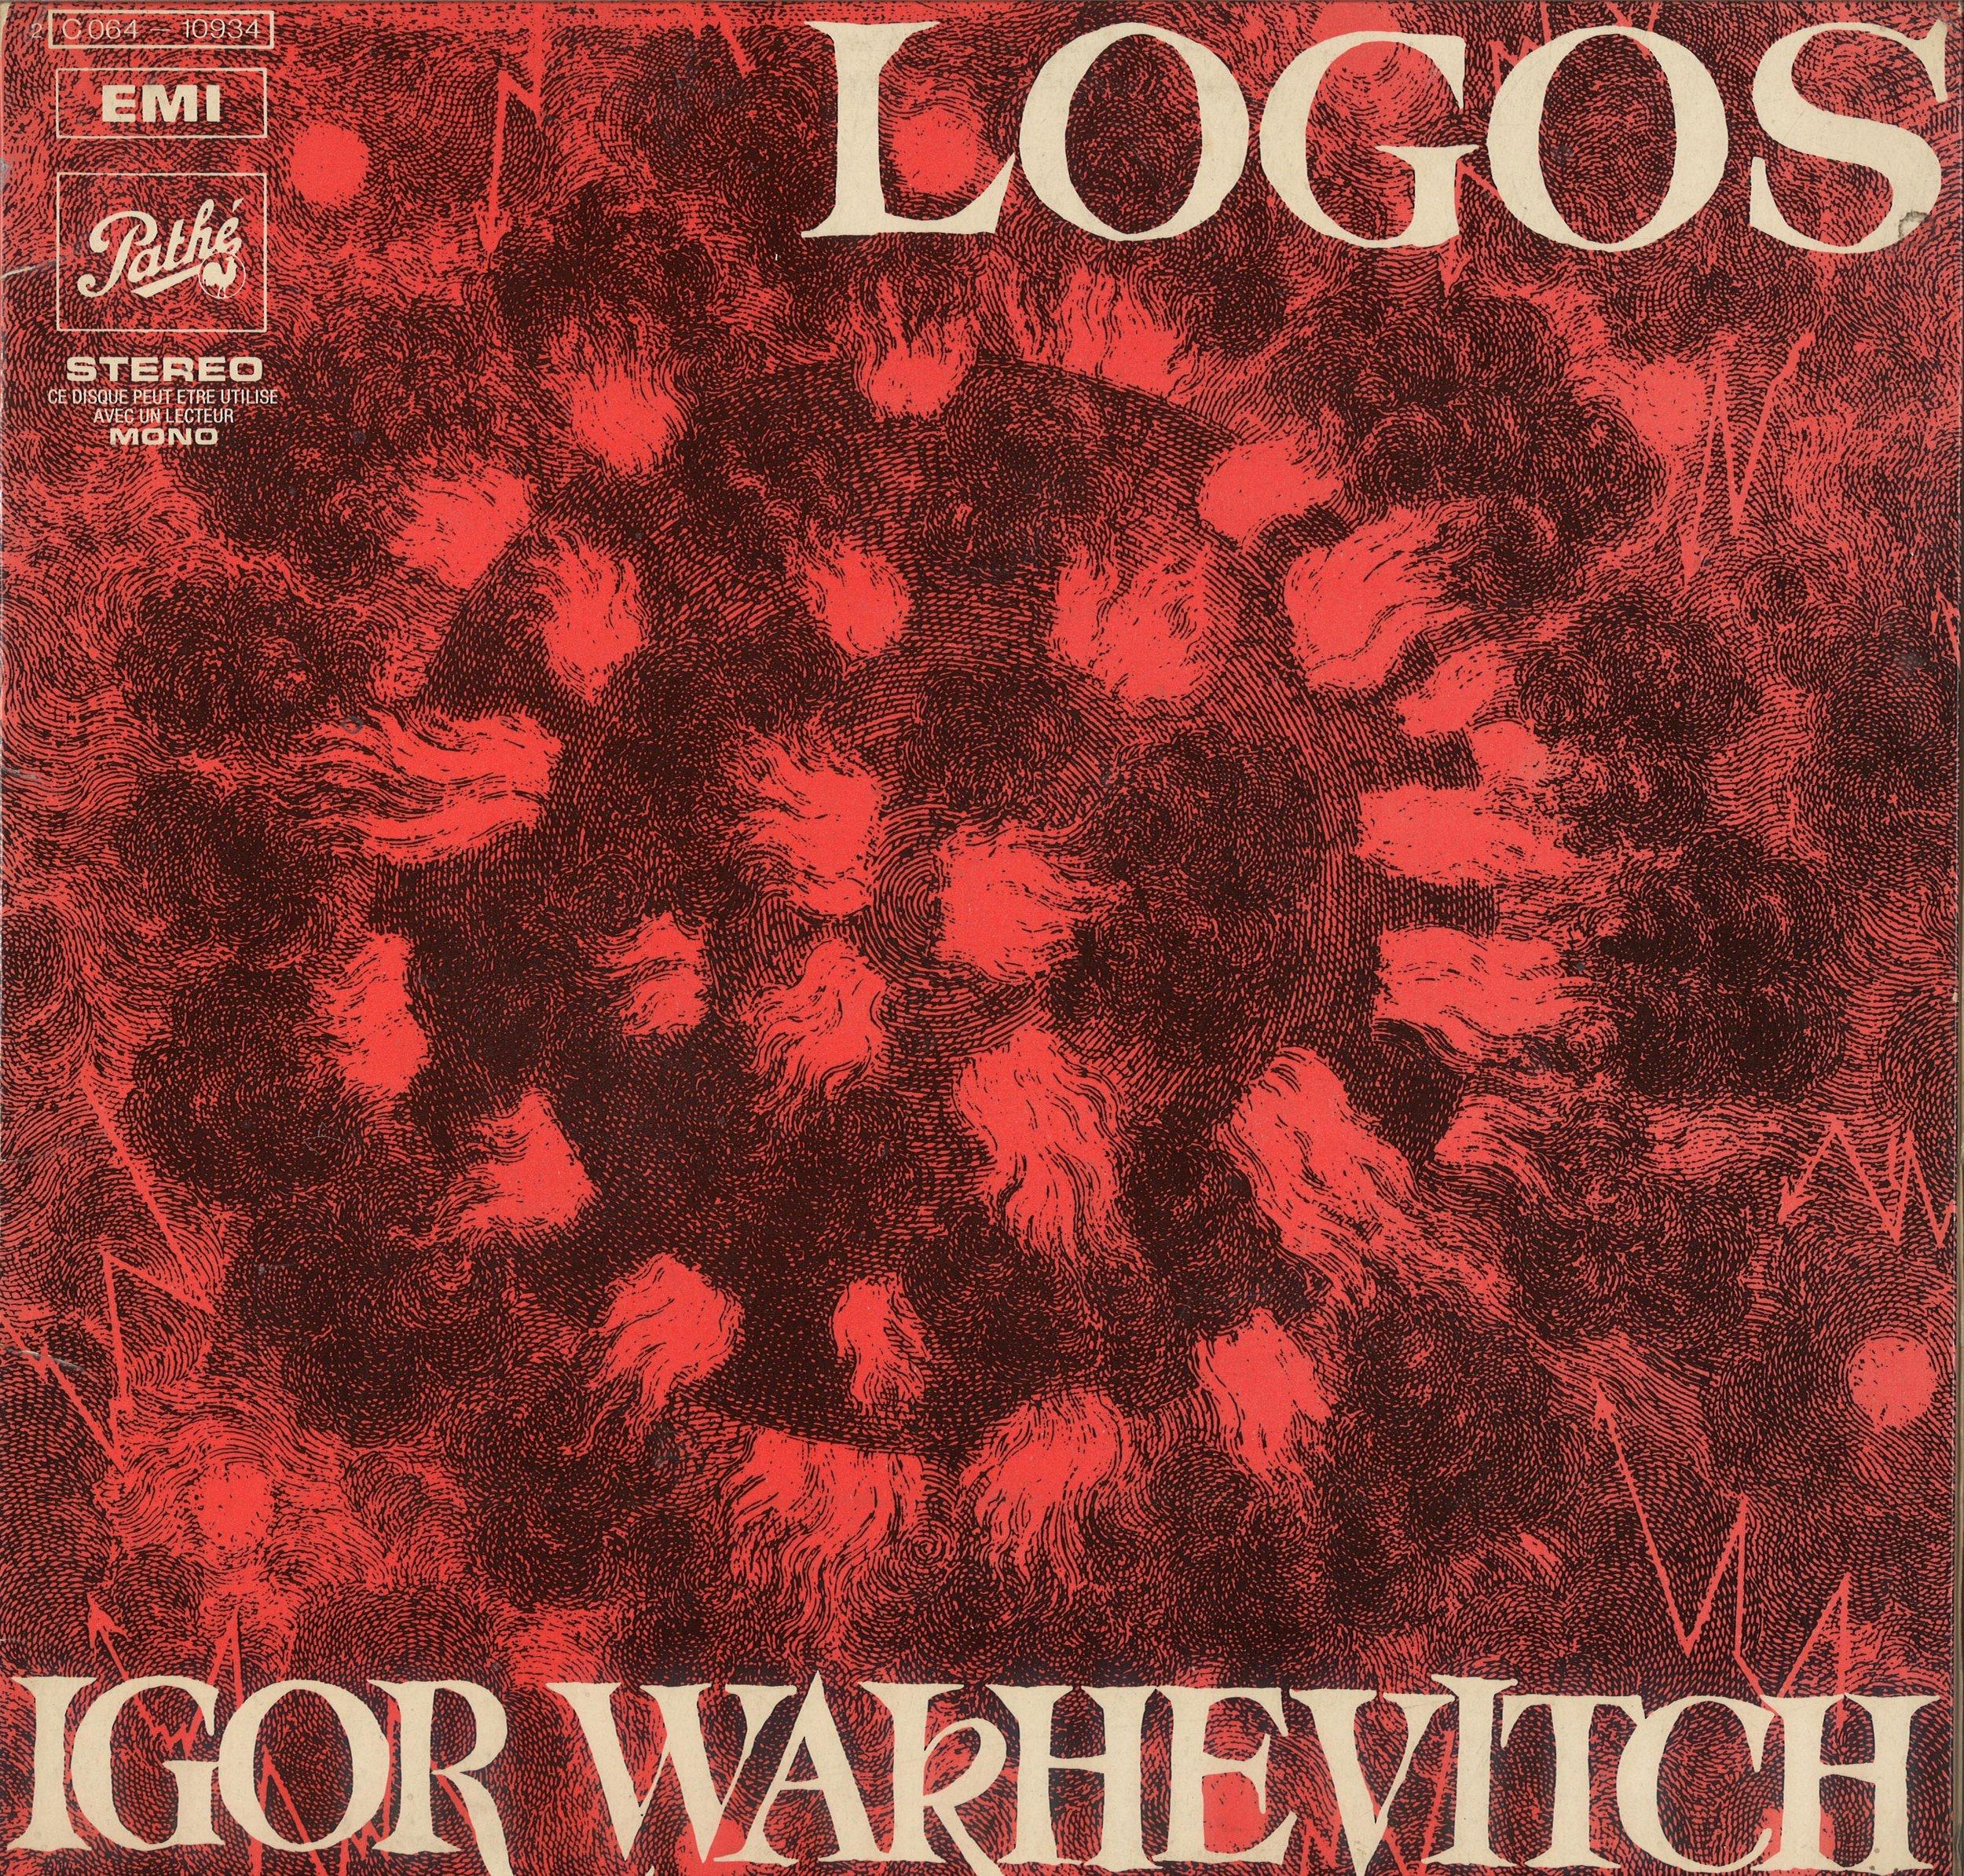 """LOGOS"" (EMI)"